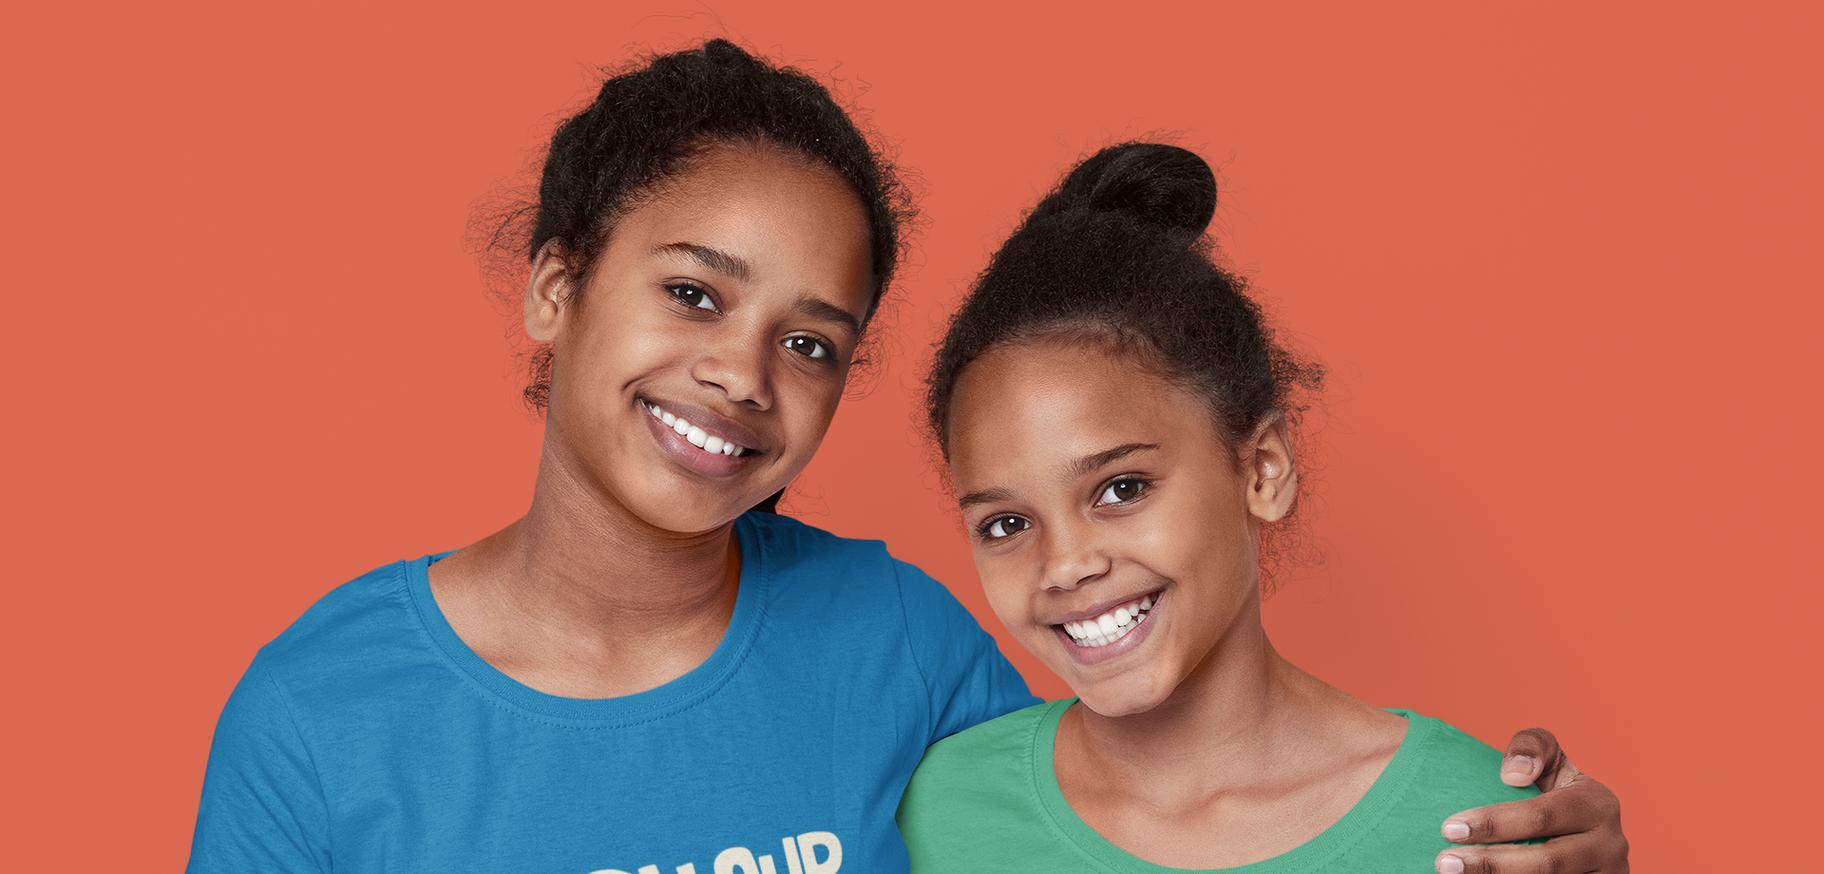 t-shirt-mockup-of-two-sisters-hugging-in-a-studio-46099-r-el2.png